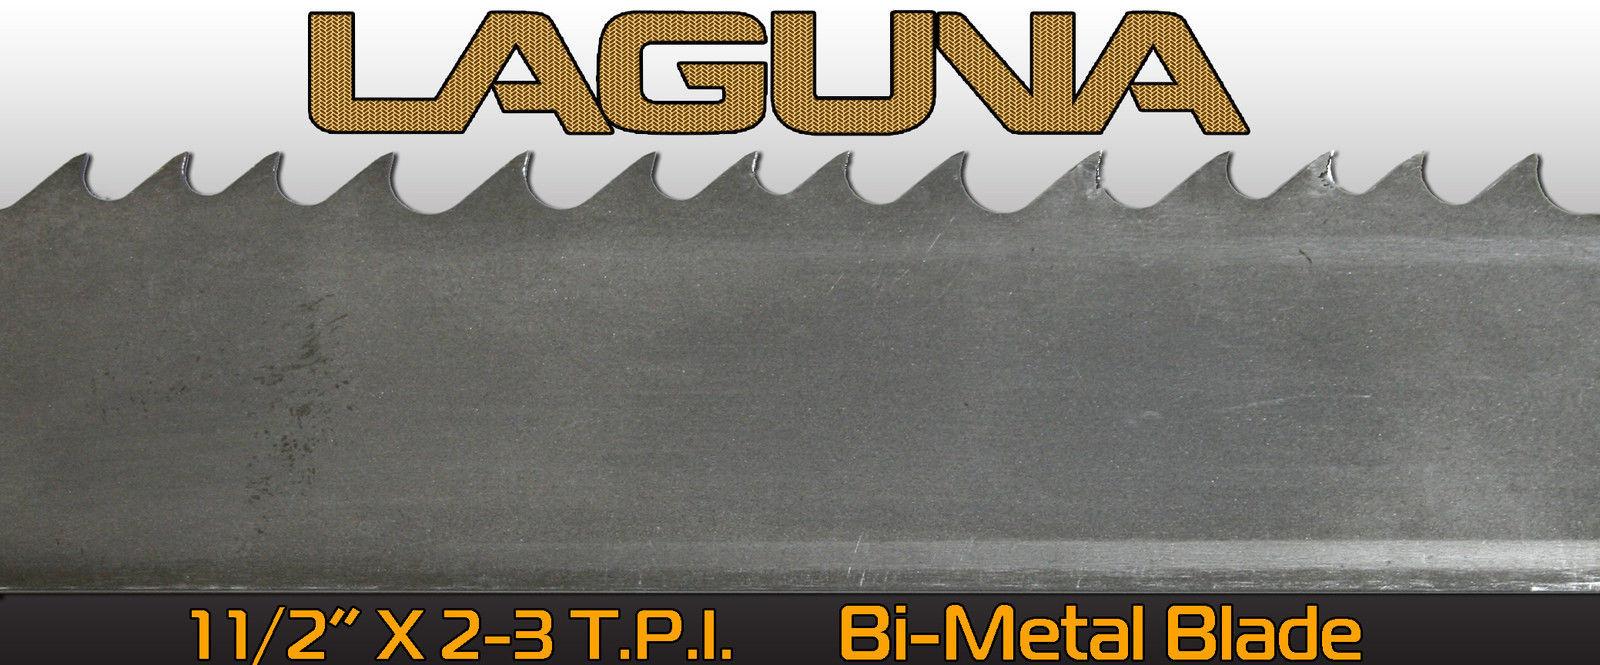 "1 1/2"" 2-3 TPI X 132"" Bimetal BandSaw Blade Laguna Tools Metal Cutting Blade"